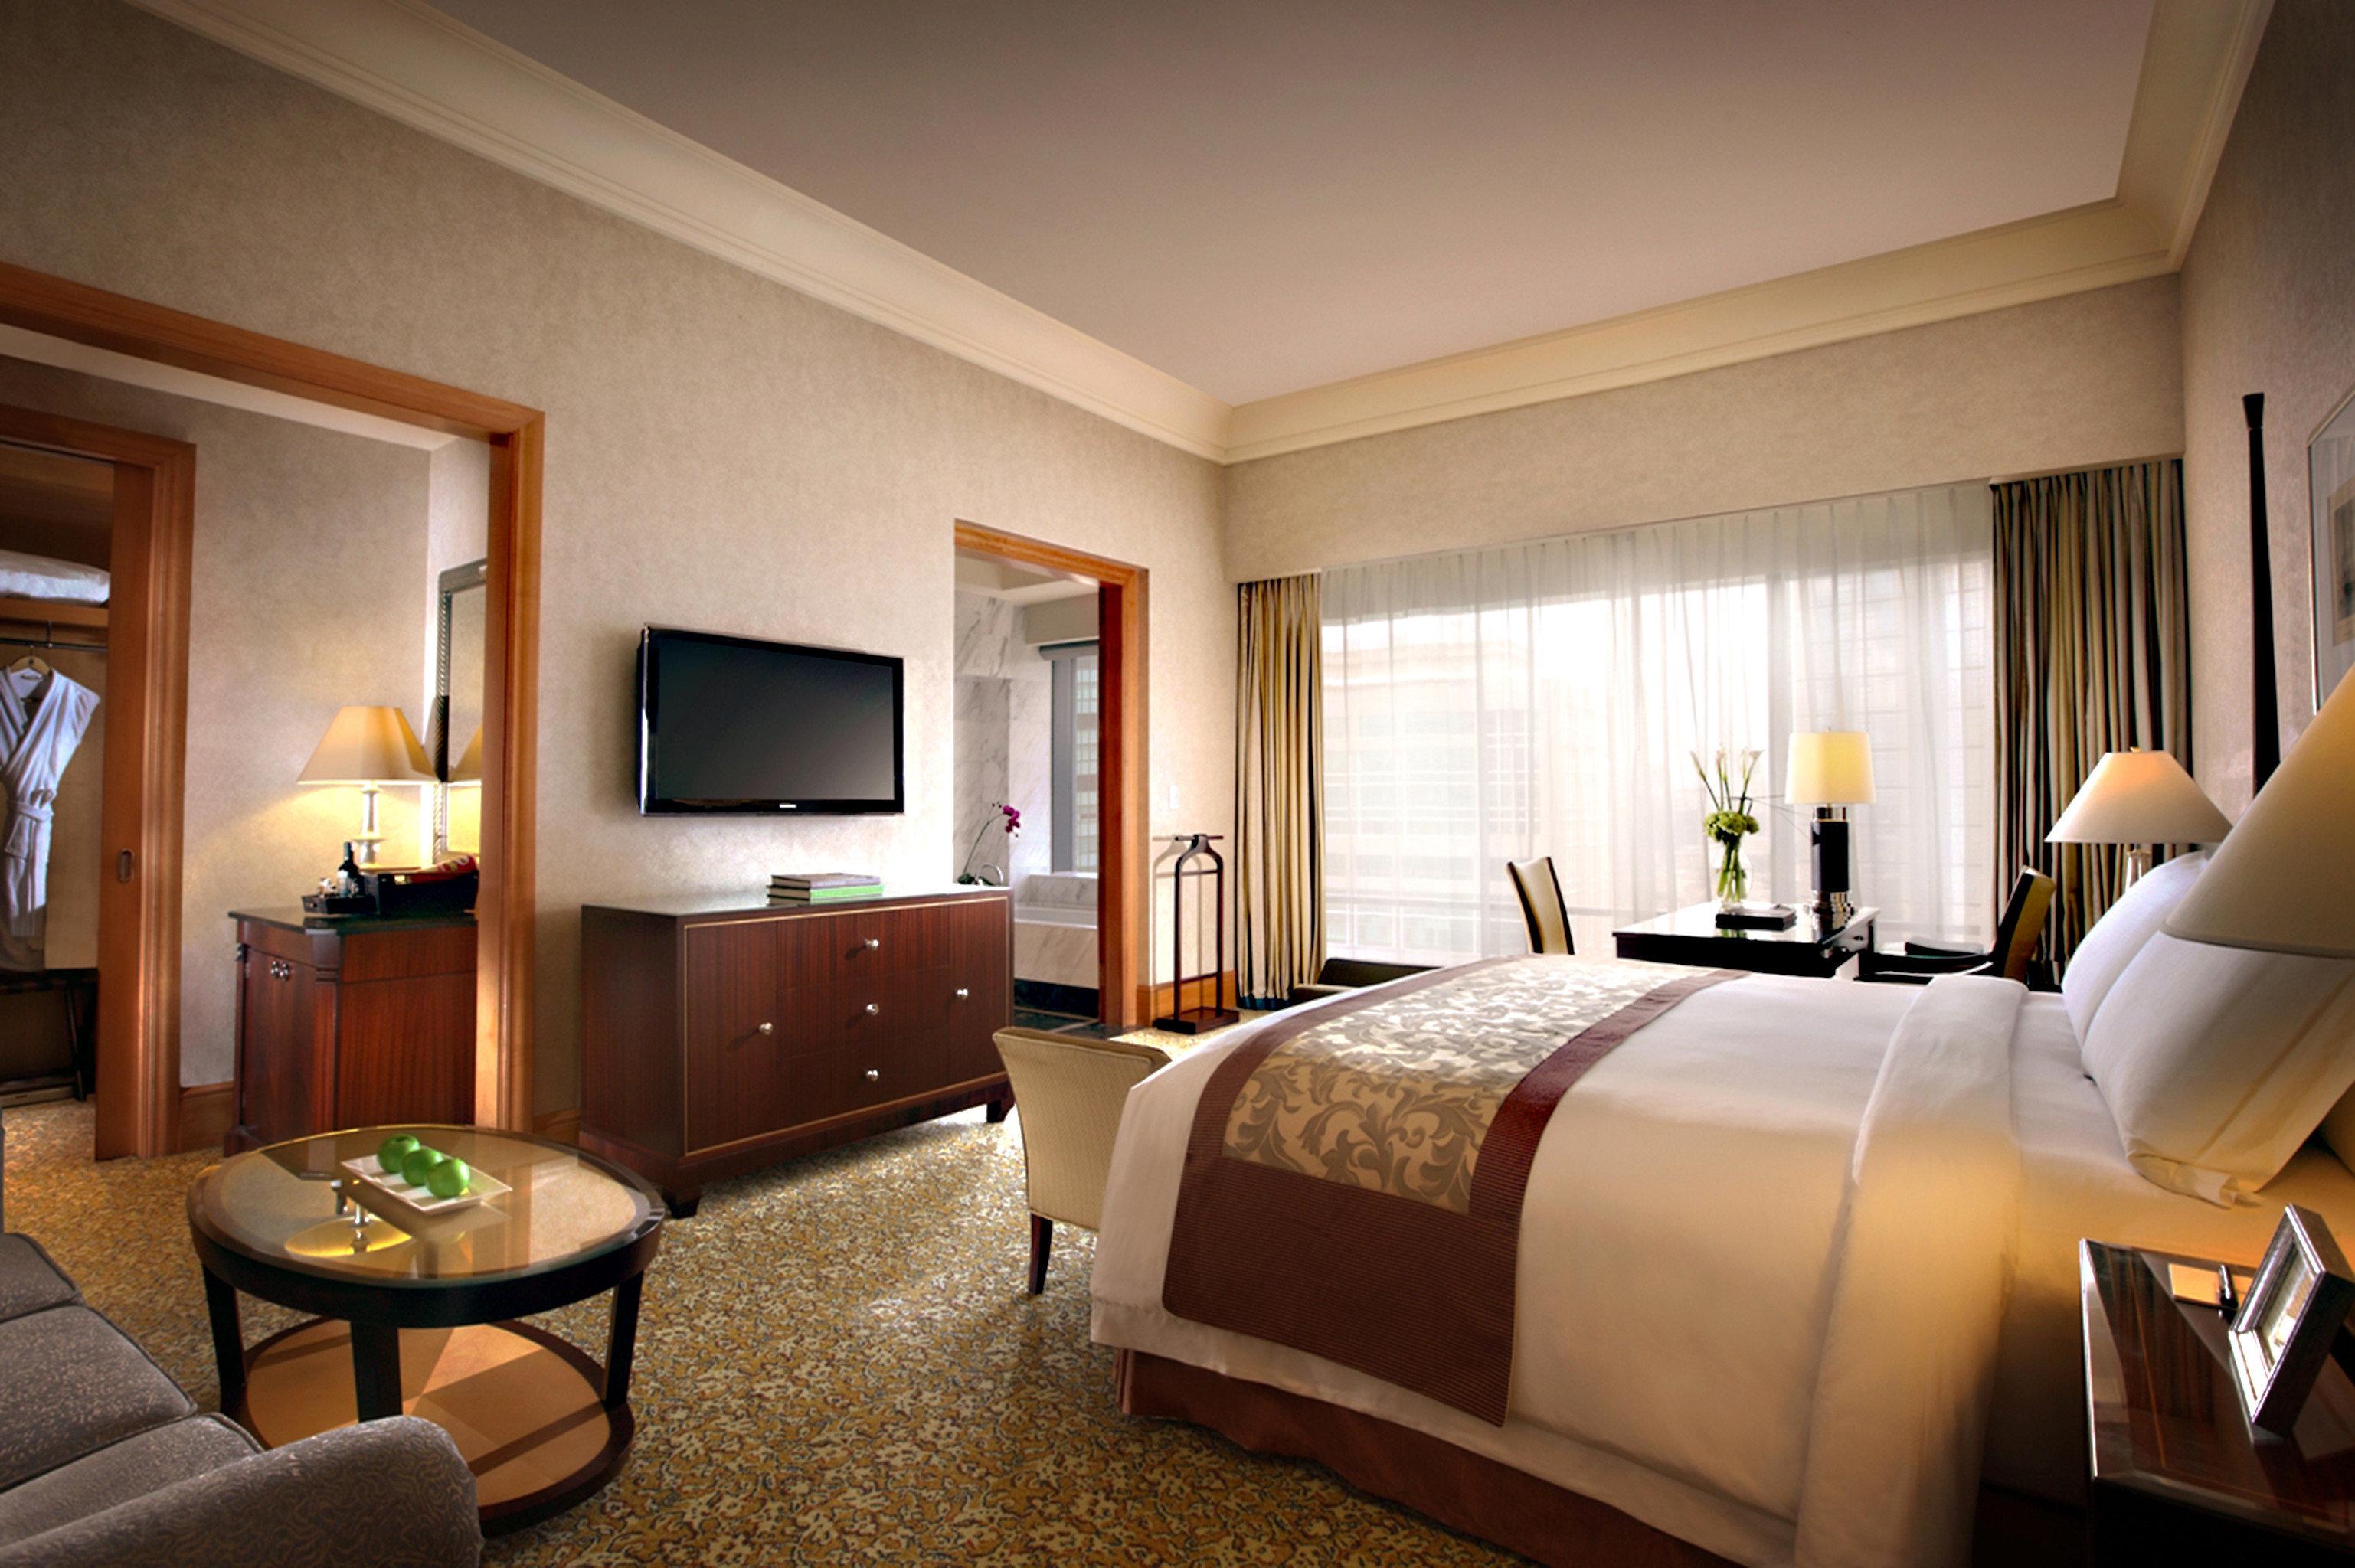 Bedroom Elegant Luxury Suite sofa property home living room condominium Resort Villa cottage flat